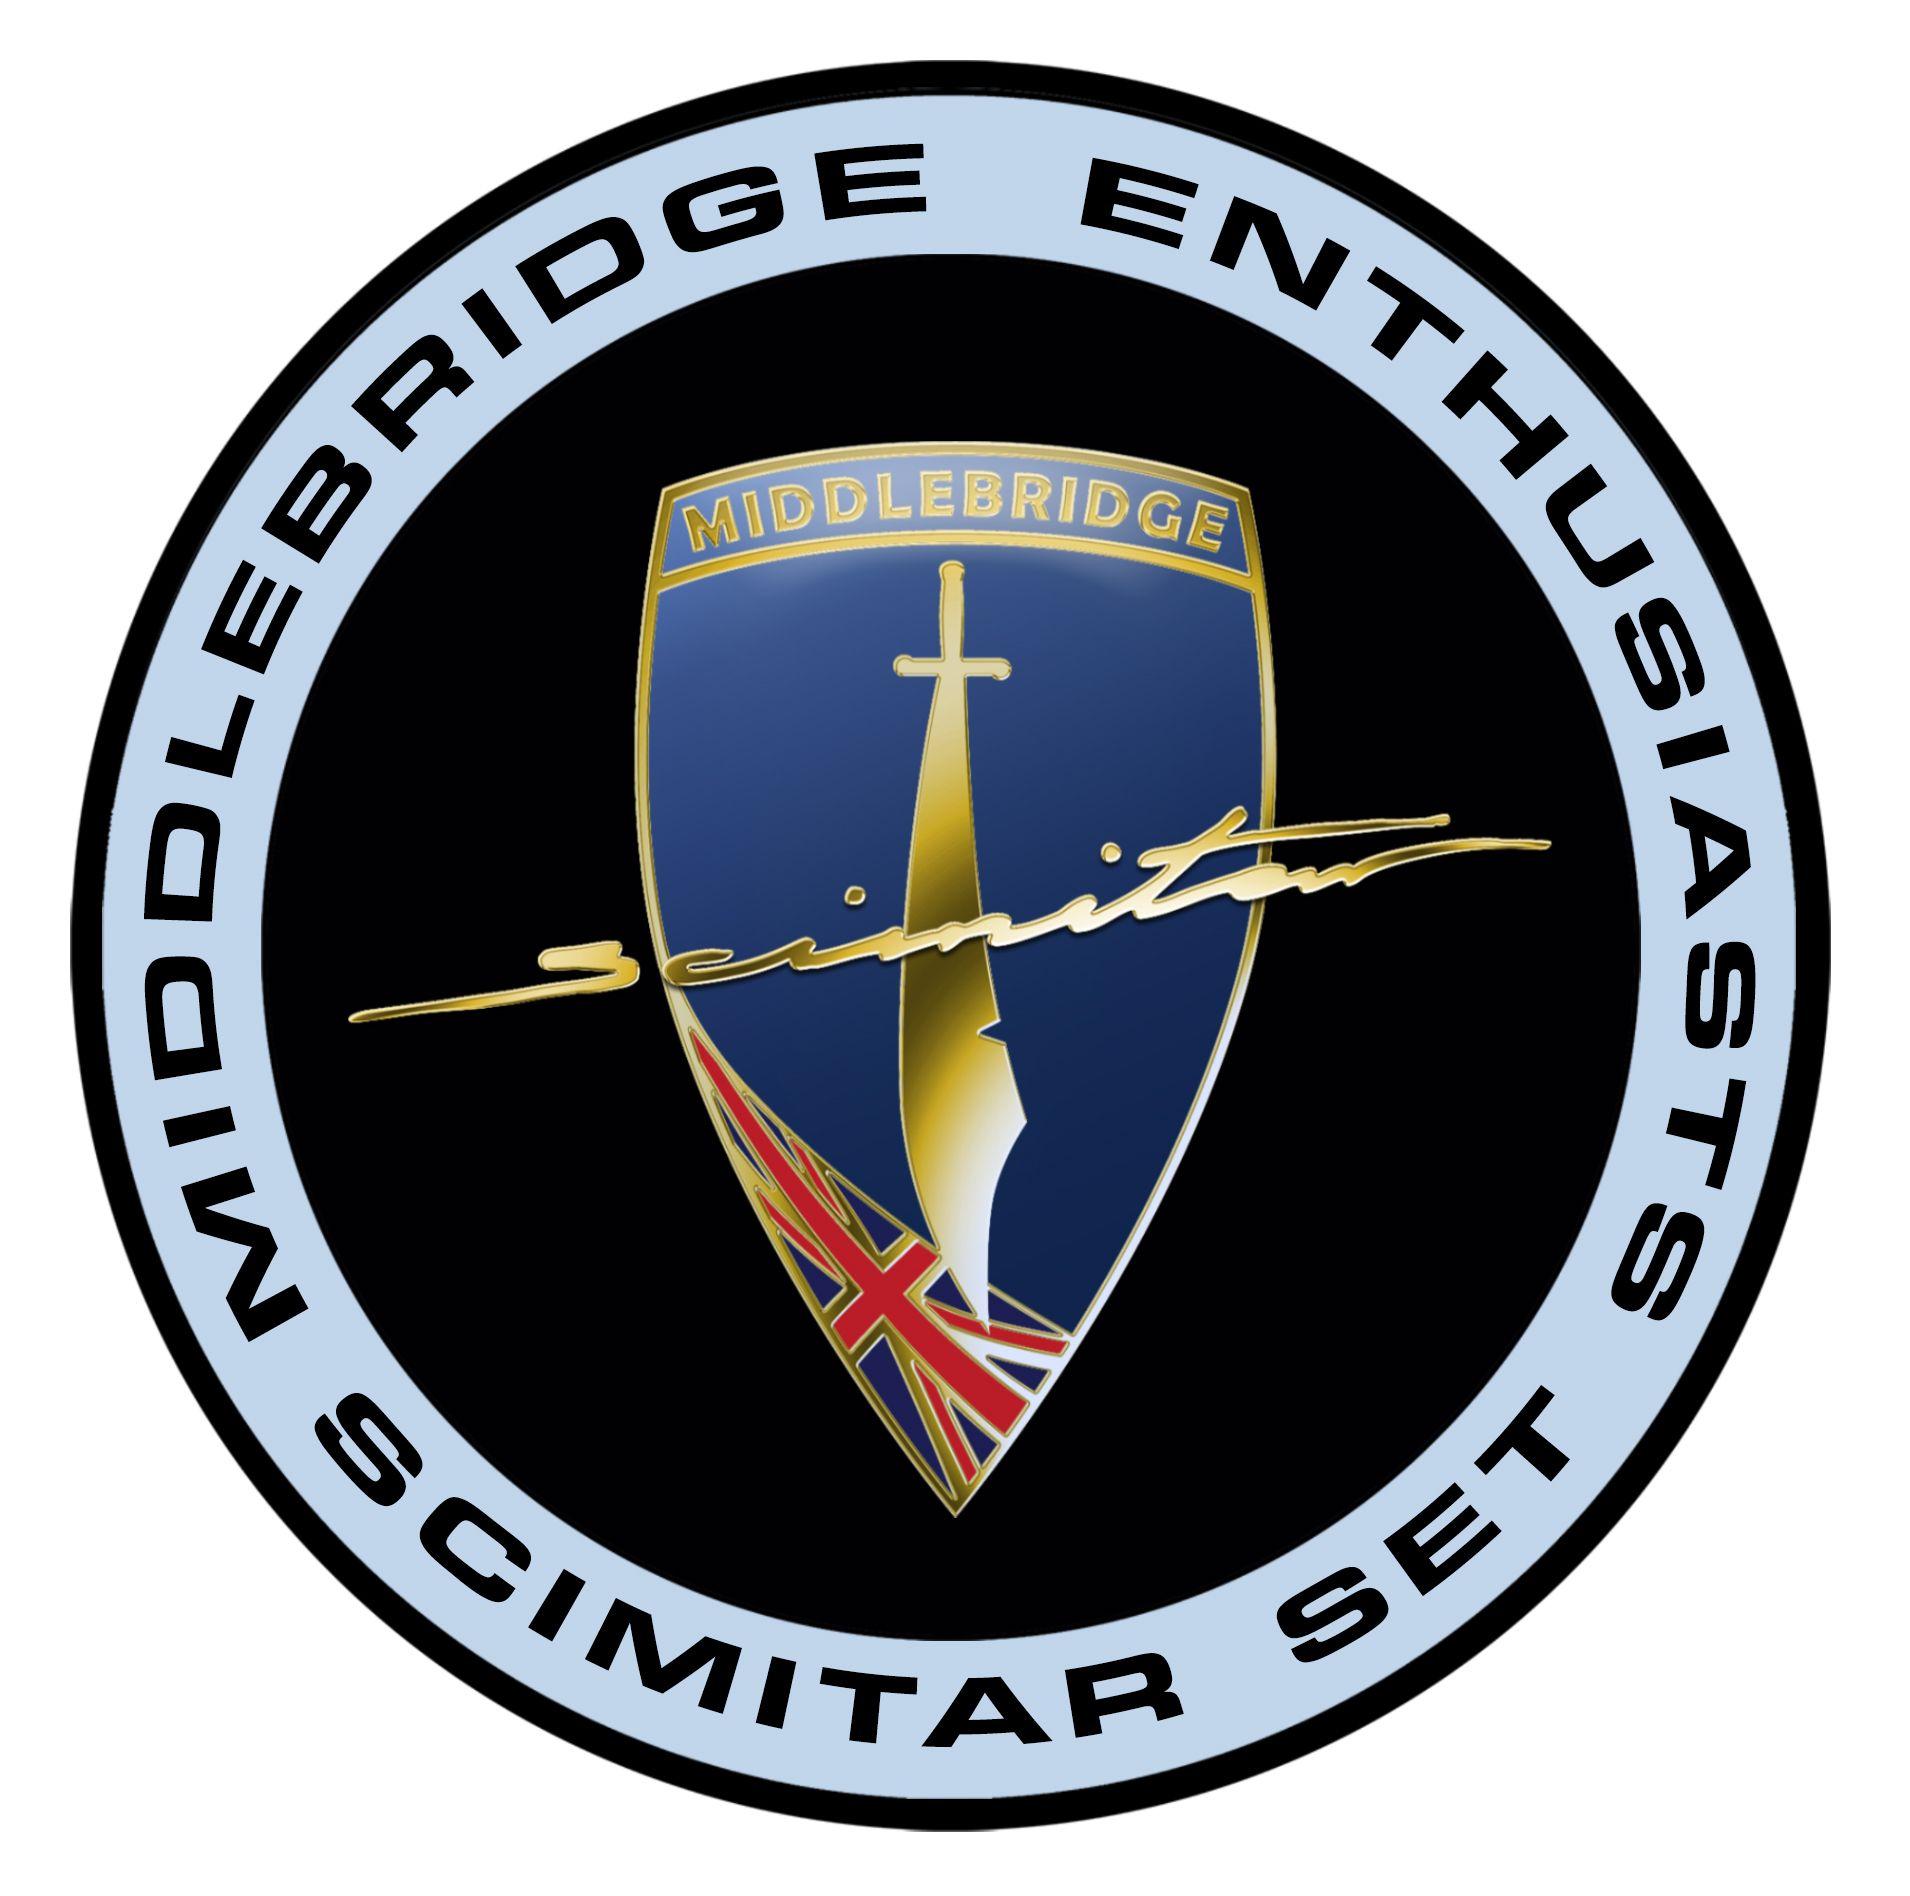 Middlebridge Enthusiasts Scimitar Set